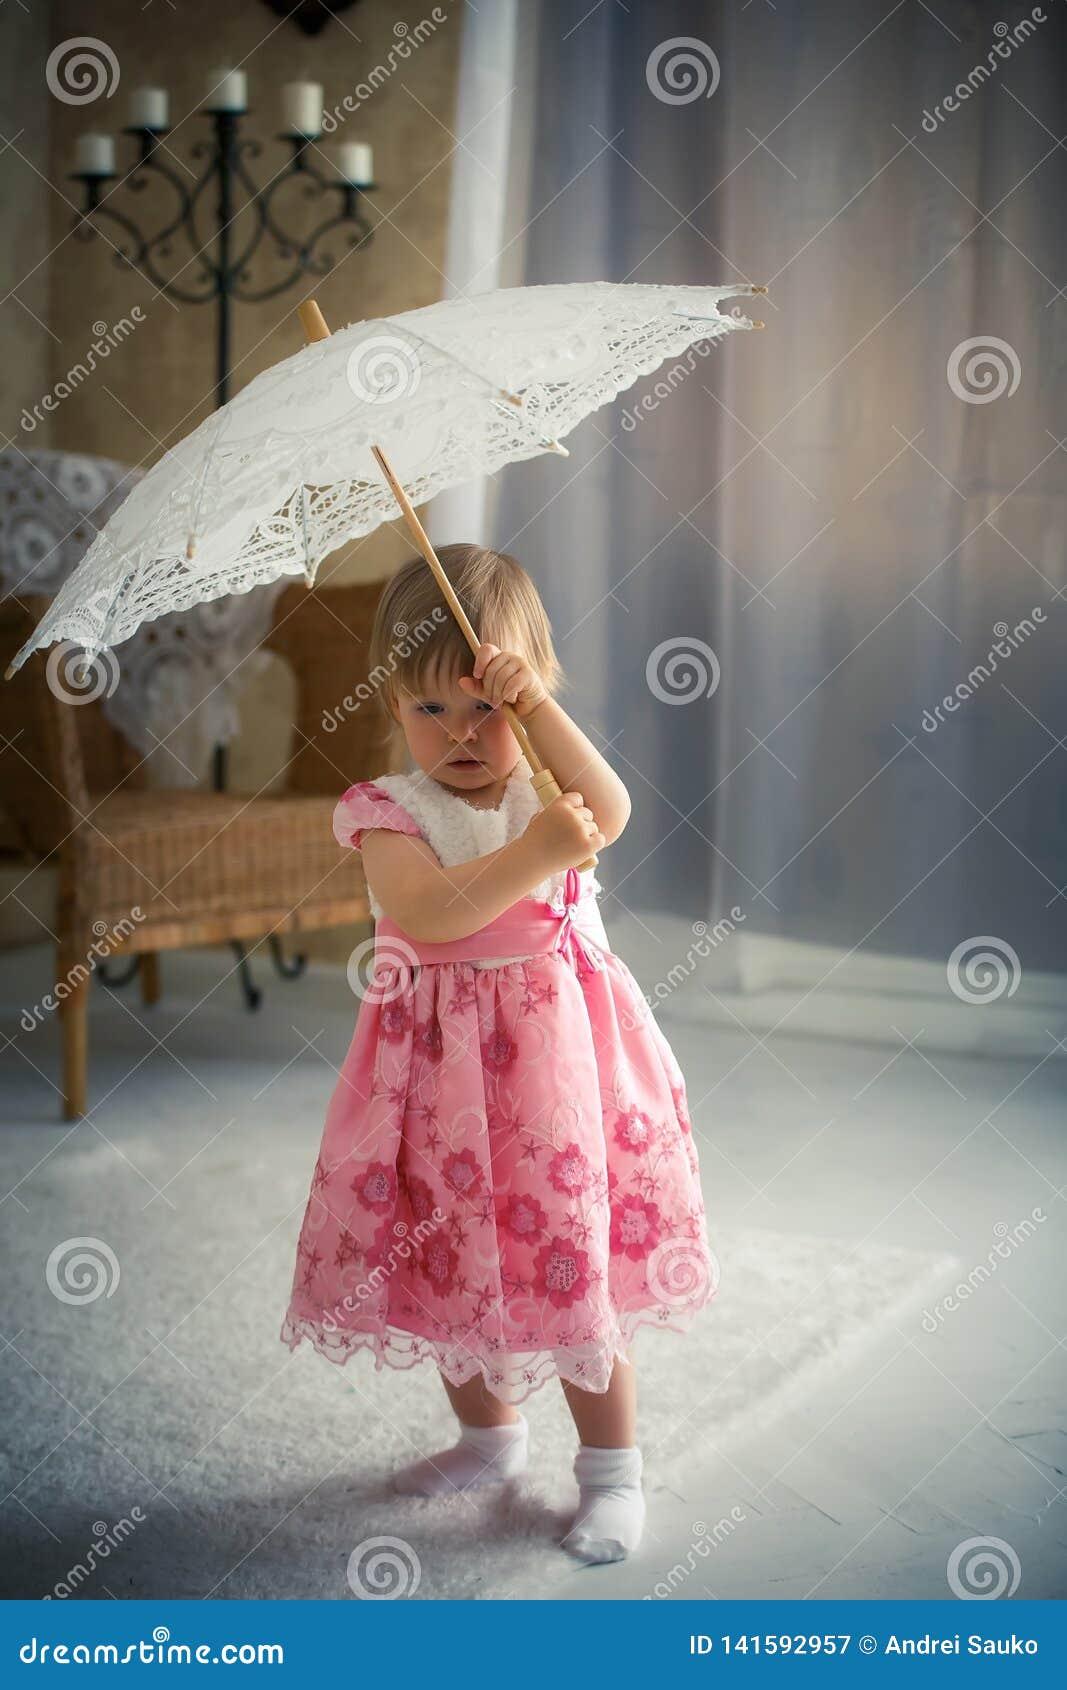 Little girl holding an umbrella for the sun